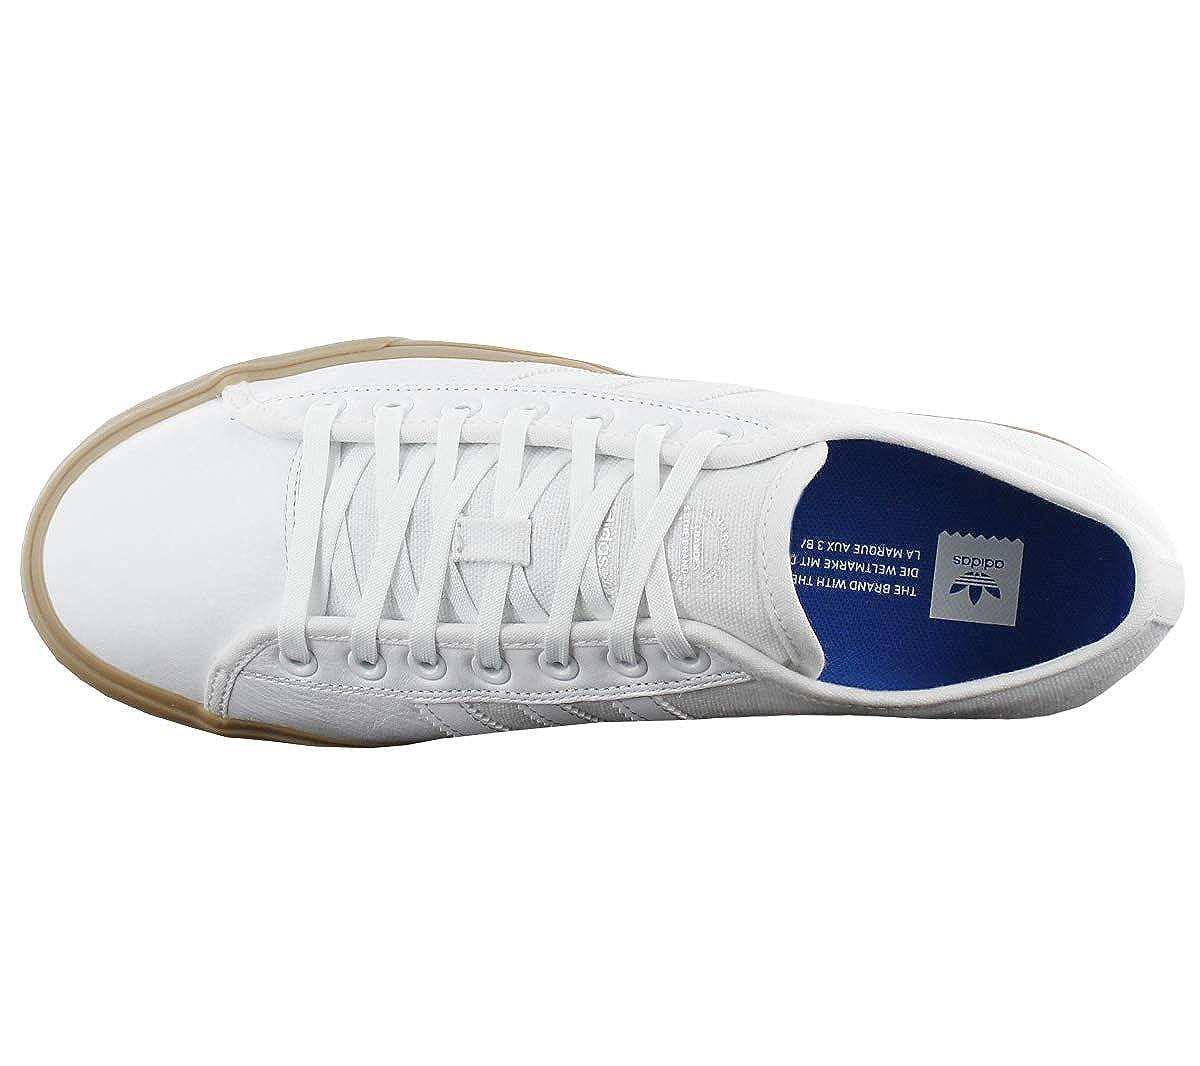 Herren blau Schuhe adidas Herren Matchcourt Rx